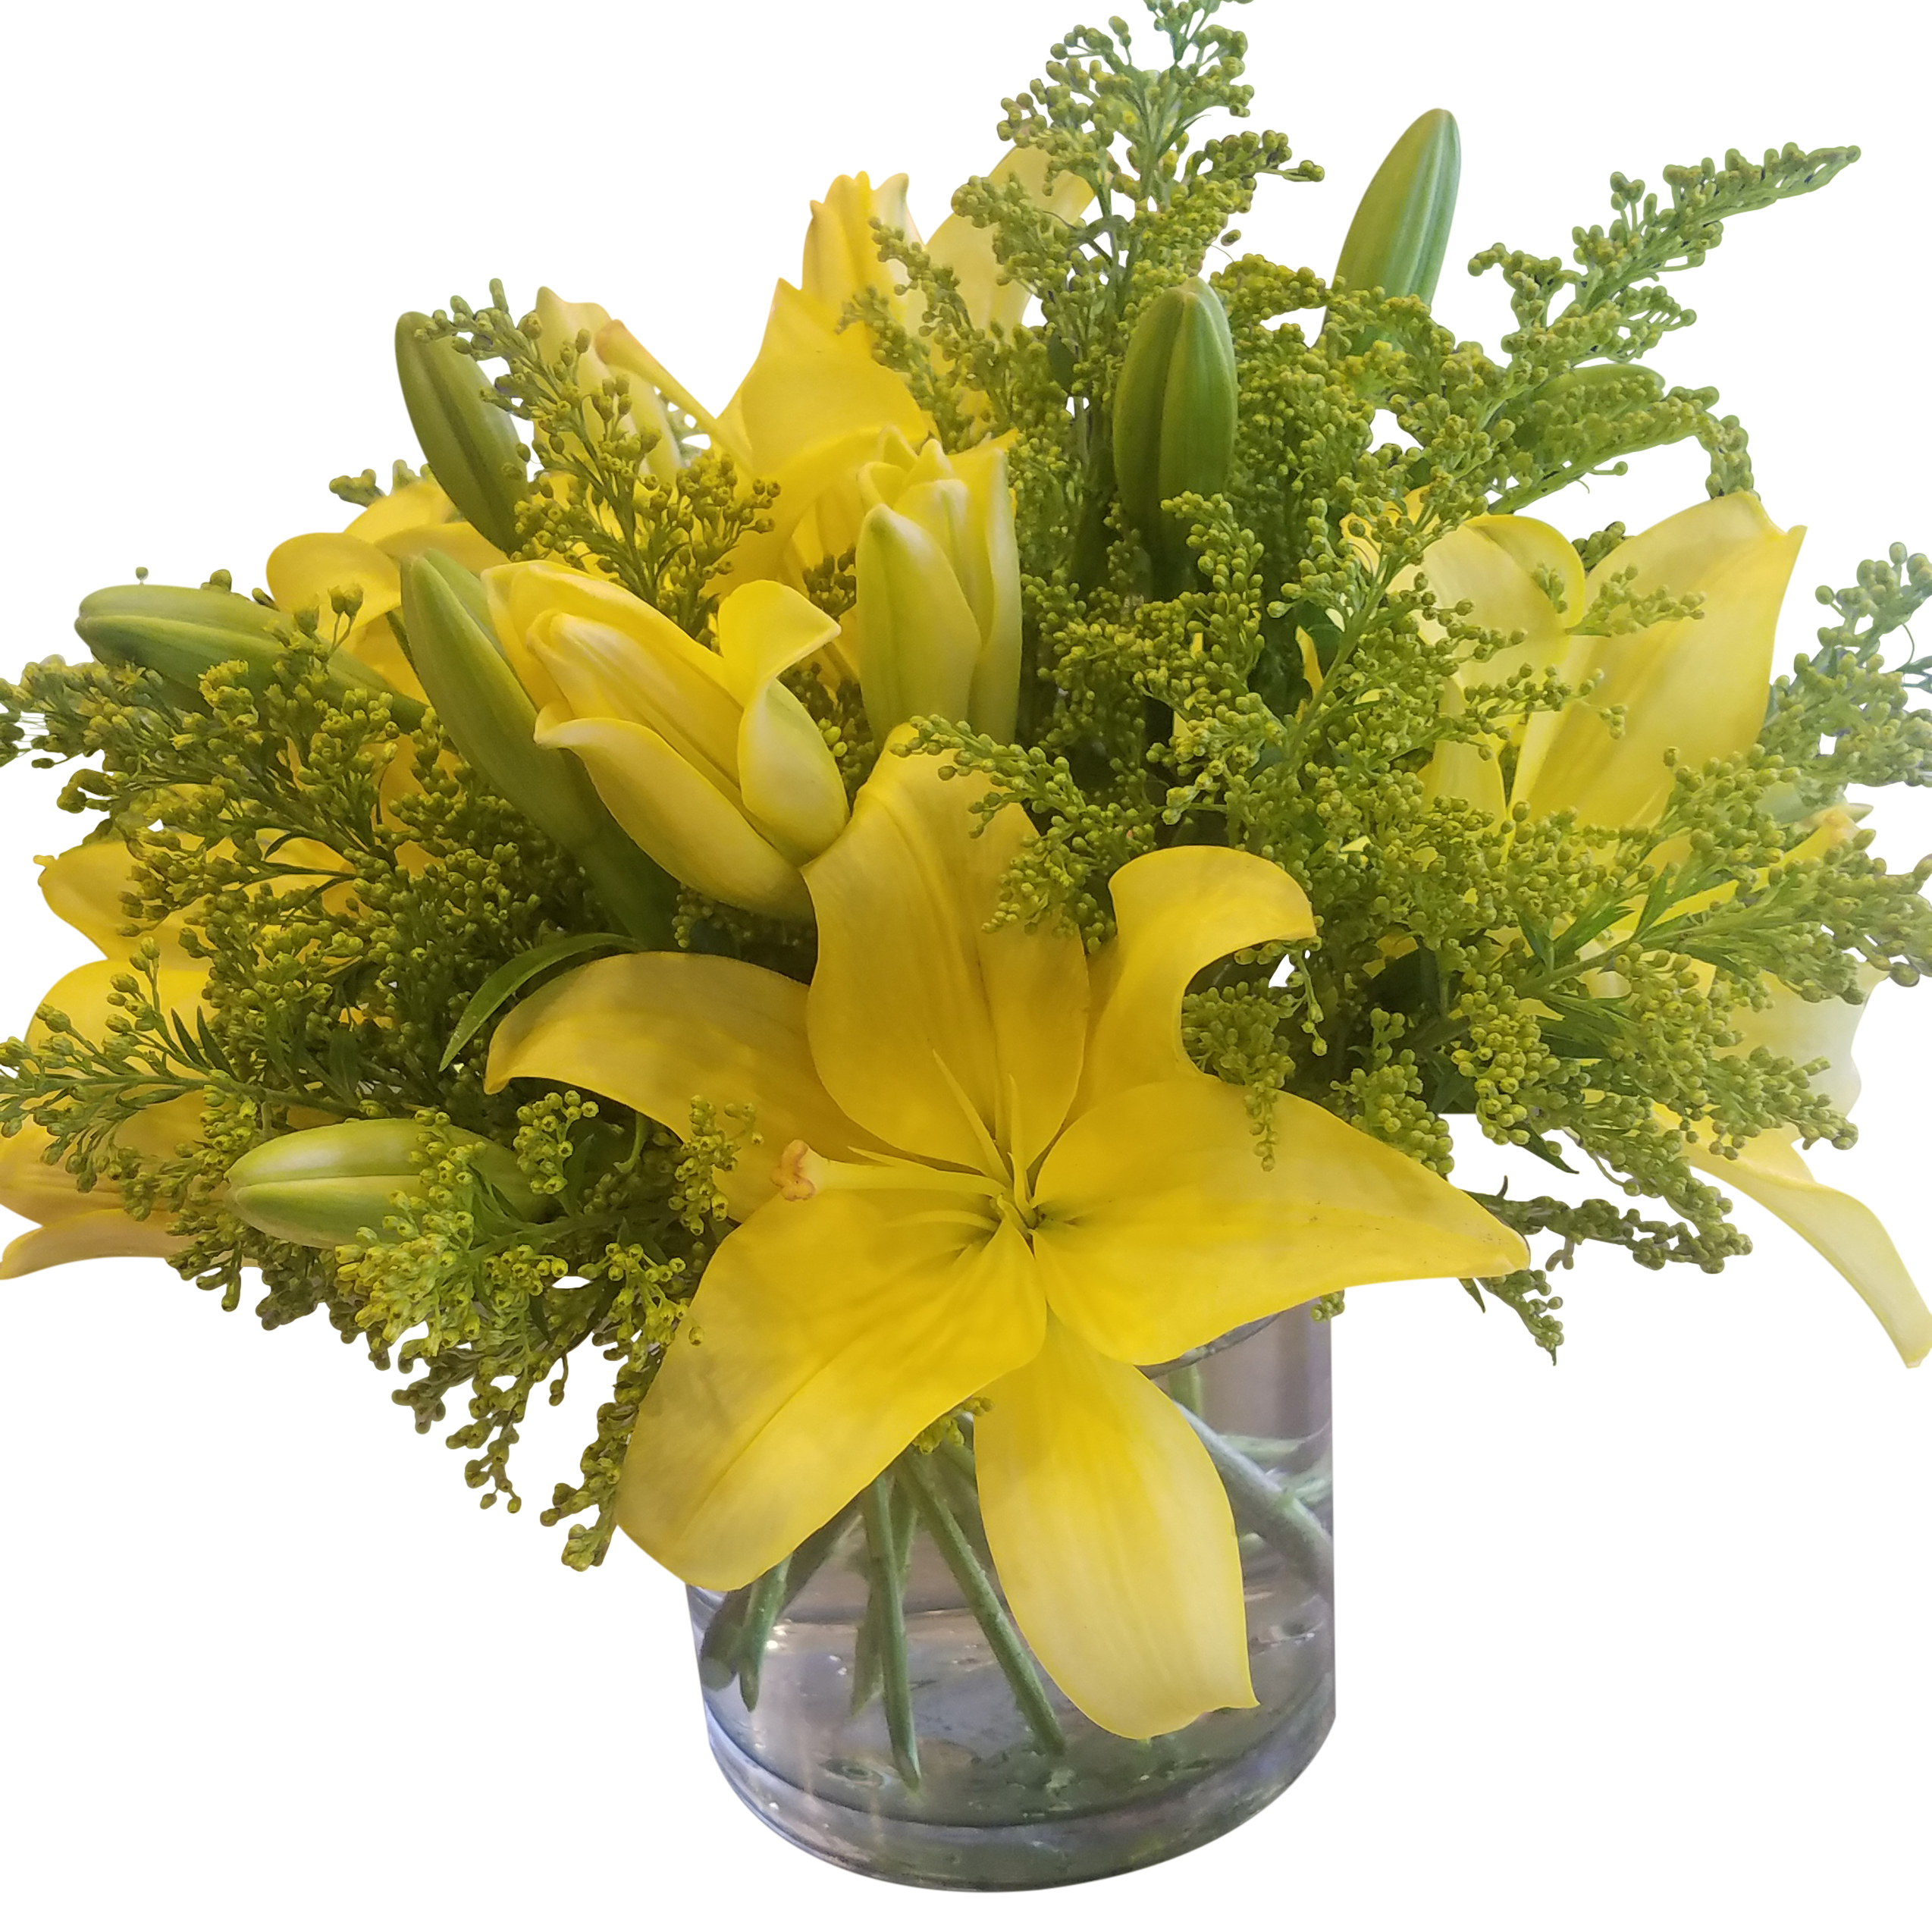 Zehrs Wedding Flowers: Sunshiney Day :: The Flower Shop